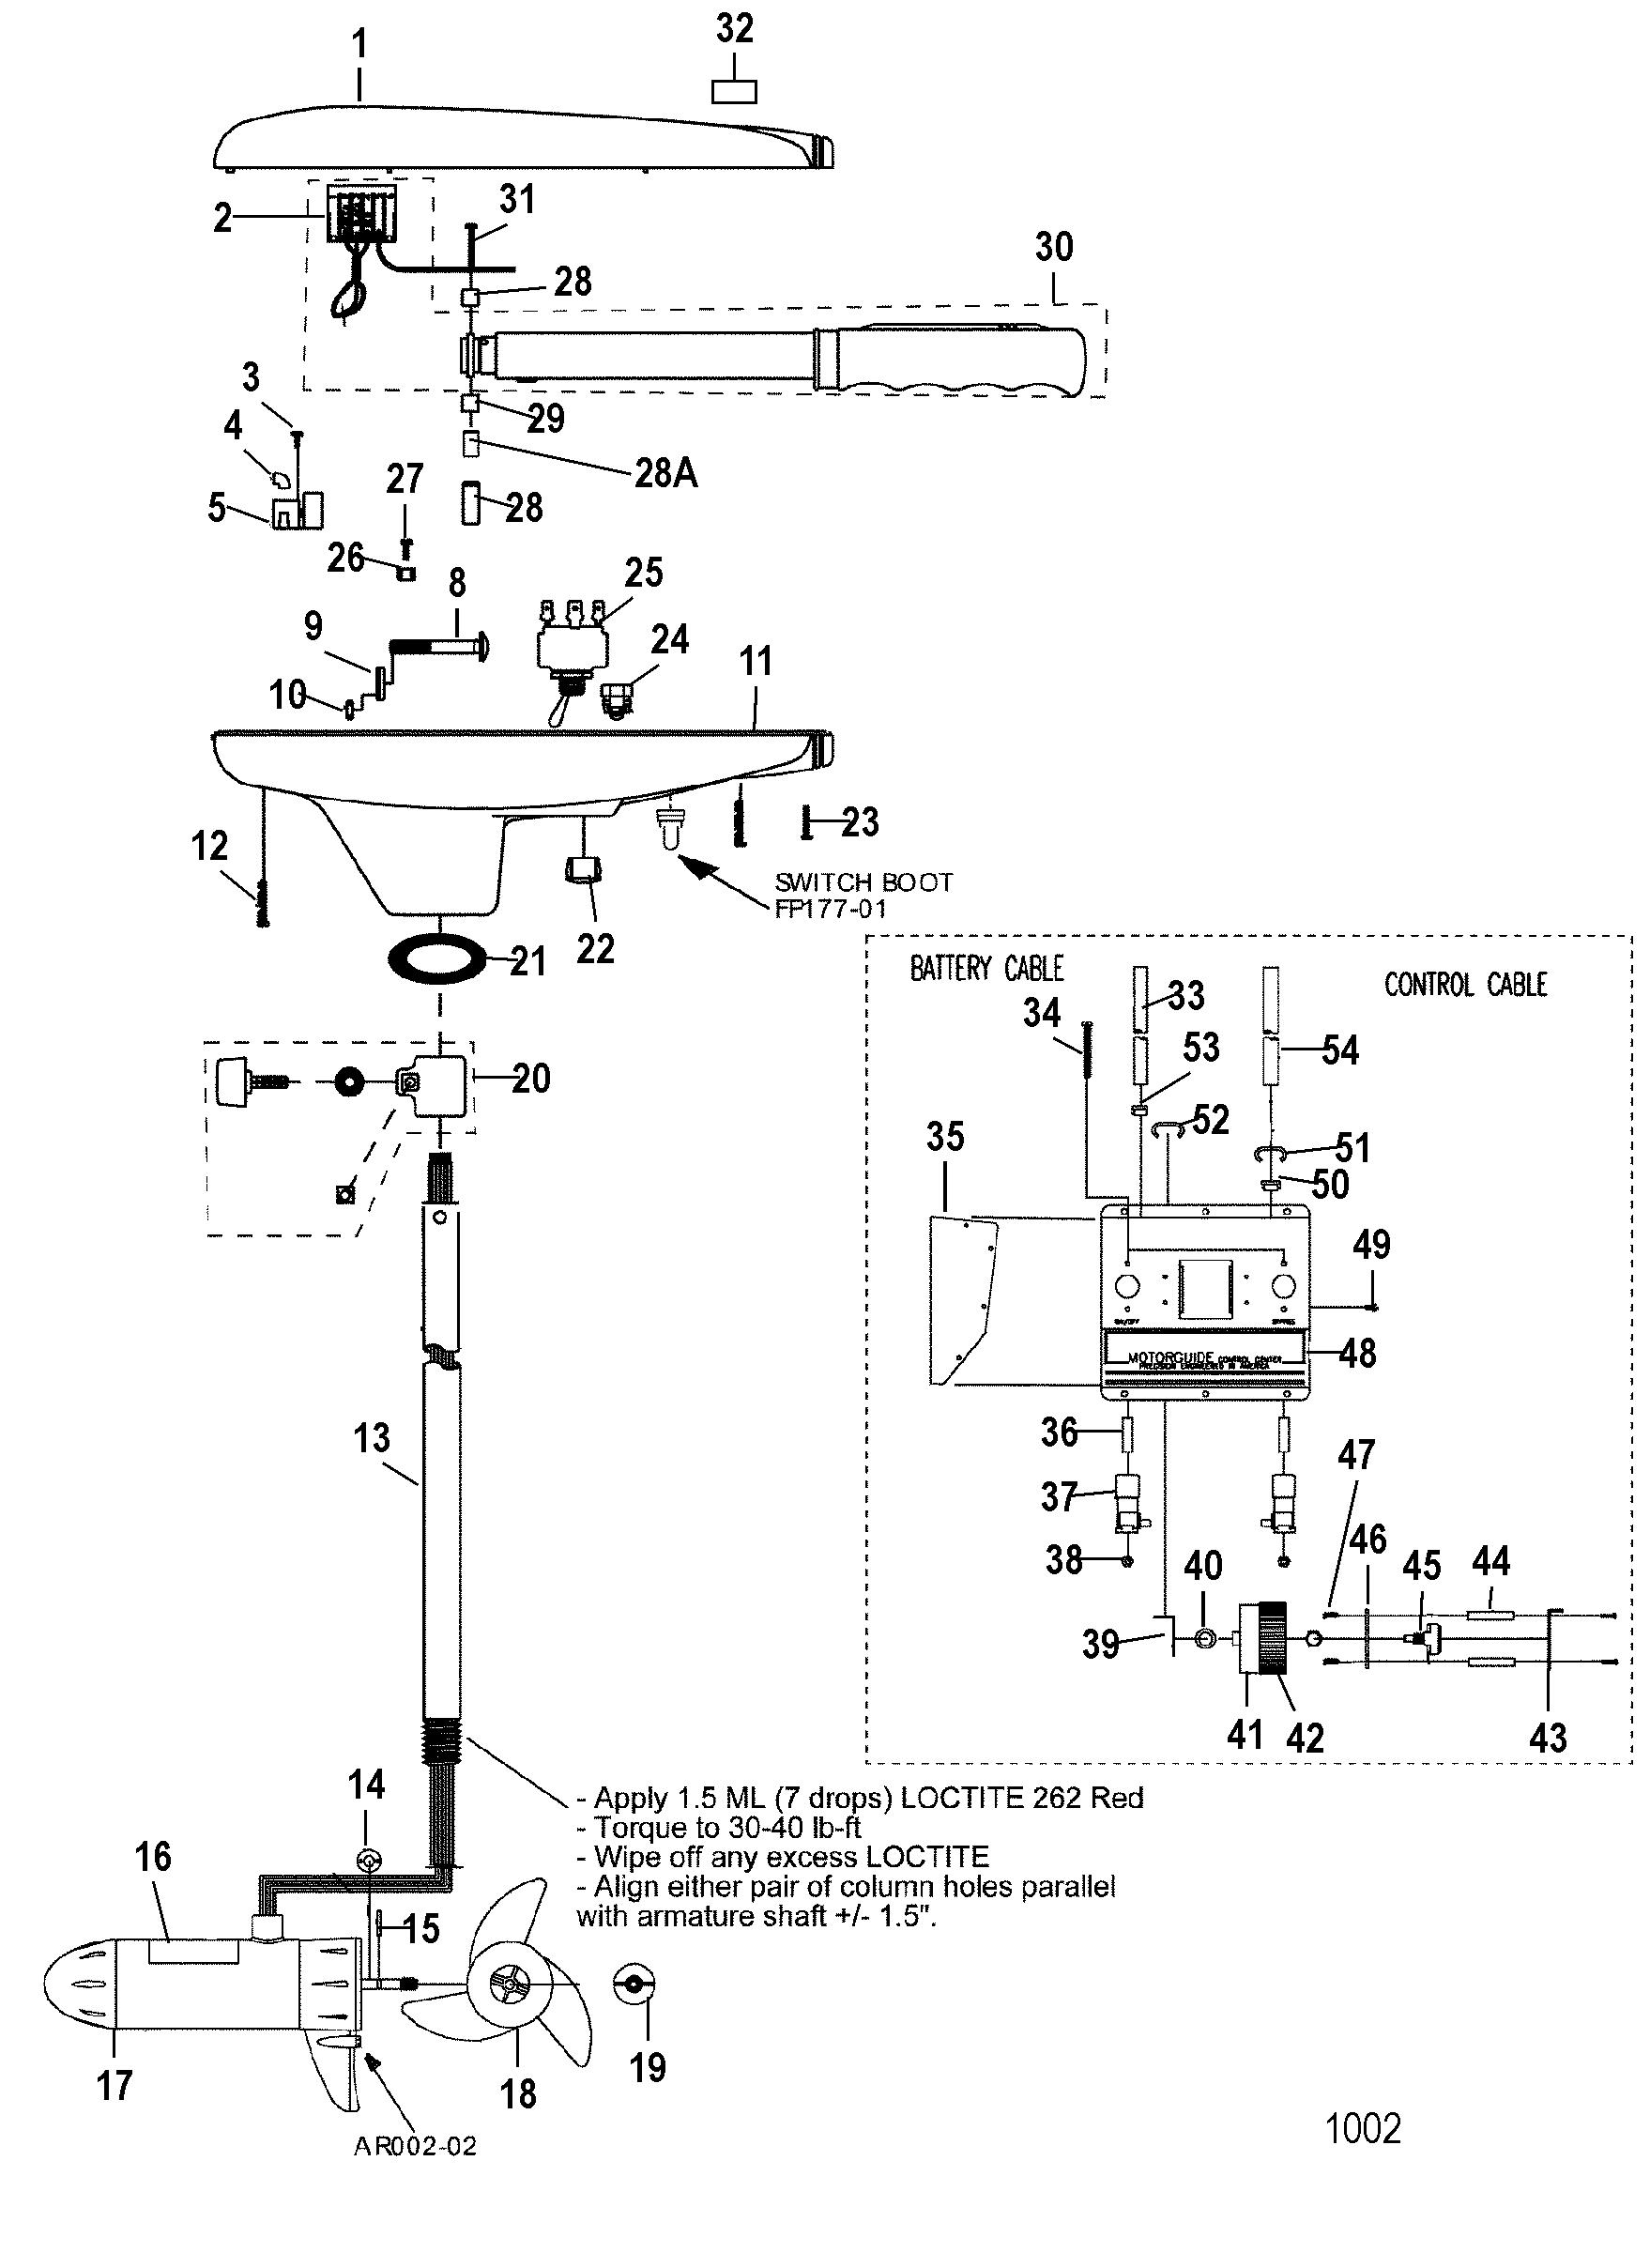 16E0 Mercury Thruster Plus Wiring Diagram | Wiring Resources